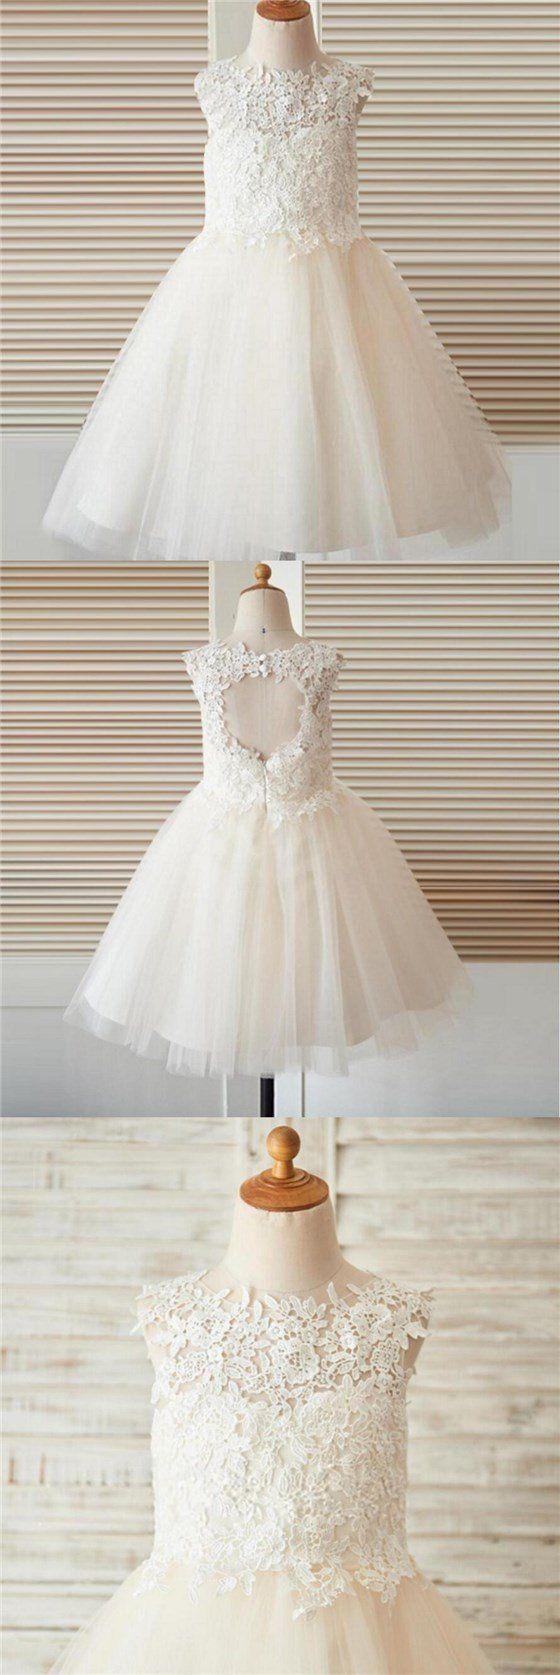 Lace up wedding dress november 2018 Open Back Top Lace Flower Girl Dresses for  Wedding  Best Sale